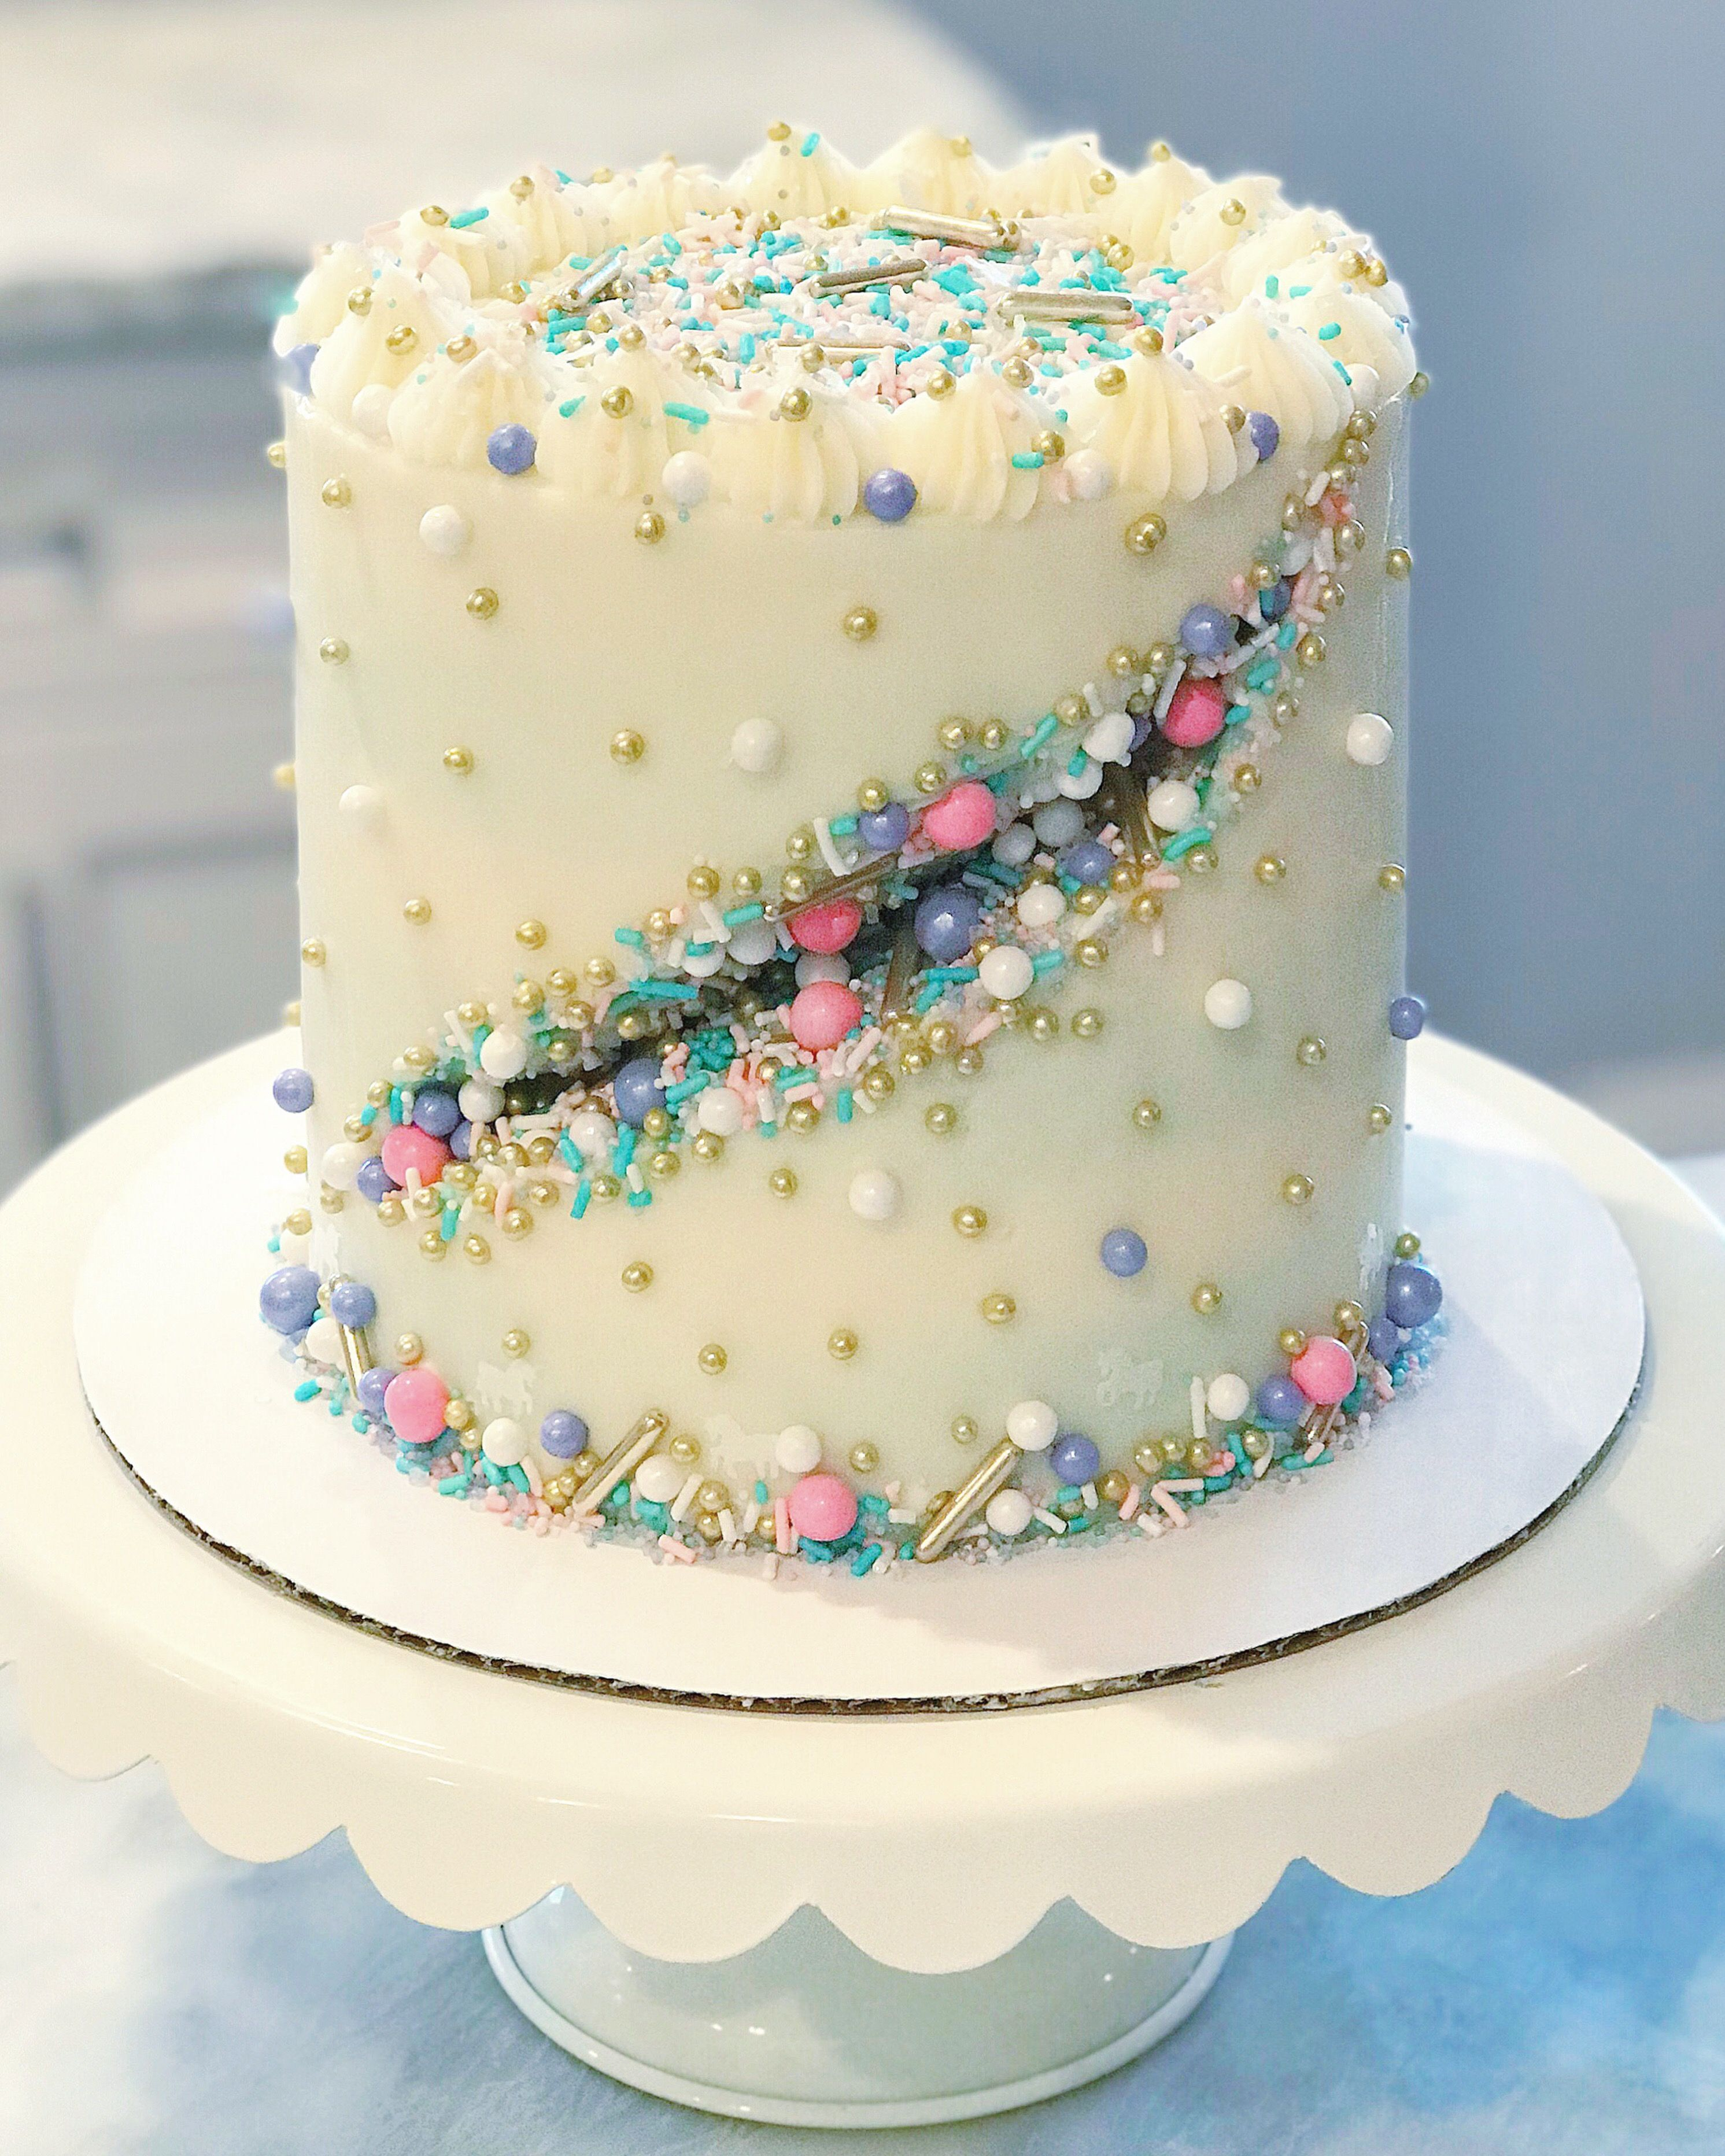 Sprinkle Cake Geode Cake Buttercream Cake Sprinkle Geode With